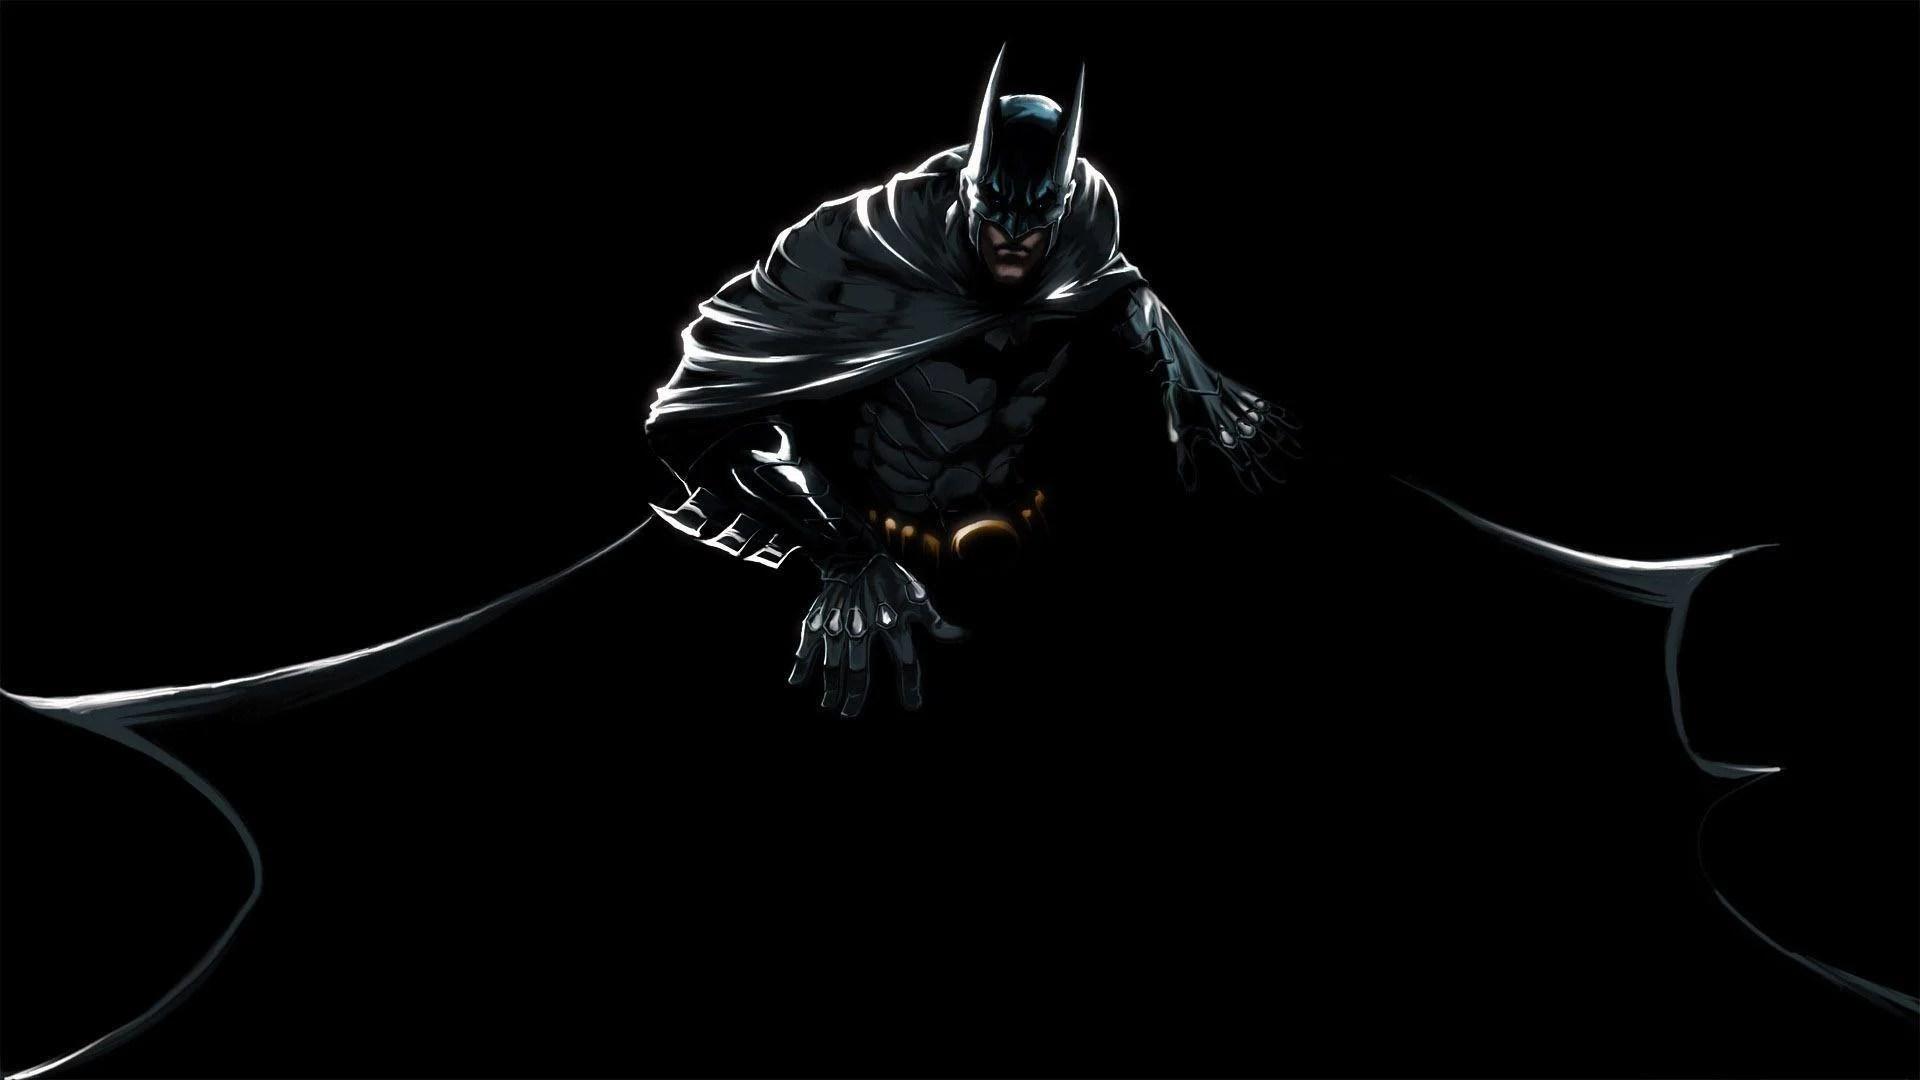 Batman Desktop Backgrounds - Wallpaper Cave